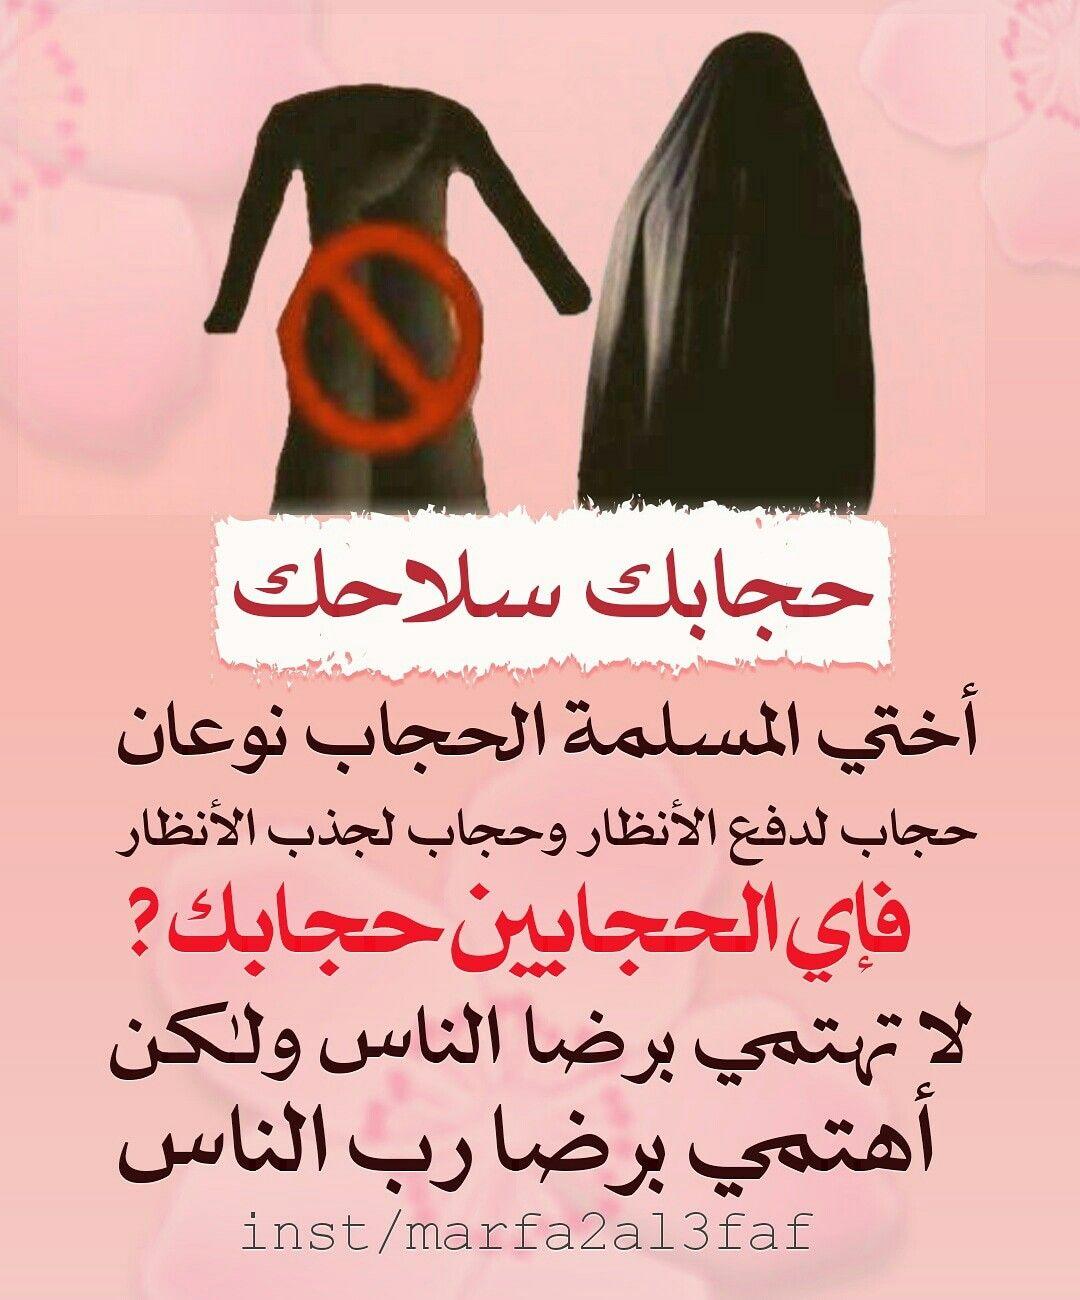 Pin By Um Ahmad On المرأة المسلمة والحجاب Movie Posters Movies Islam